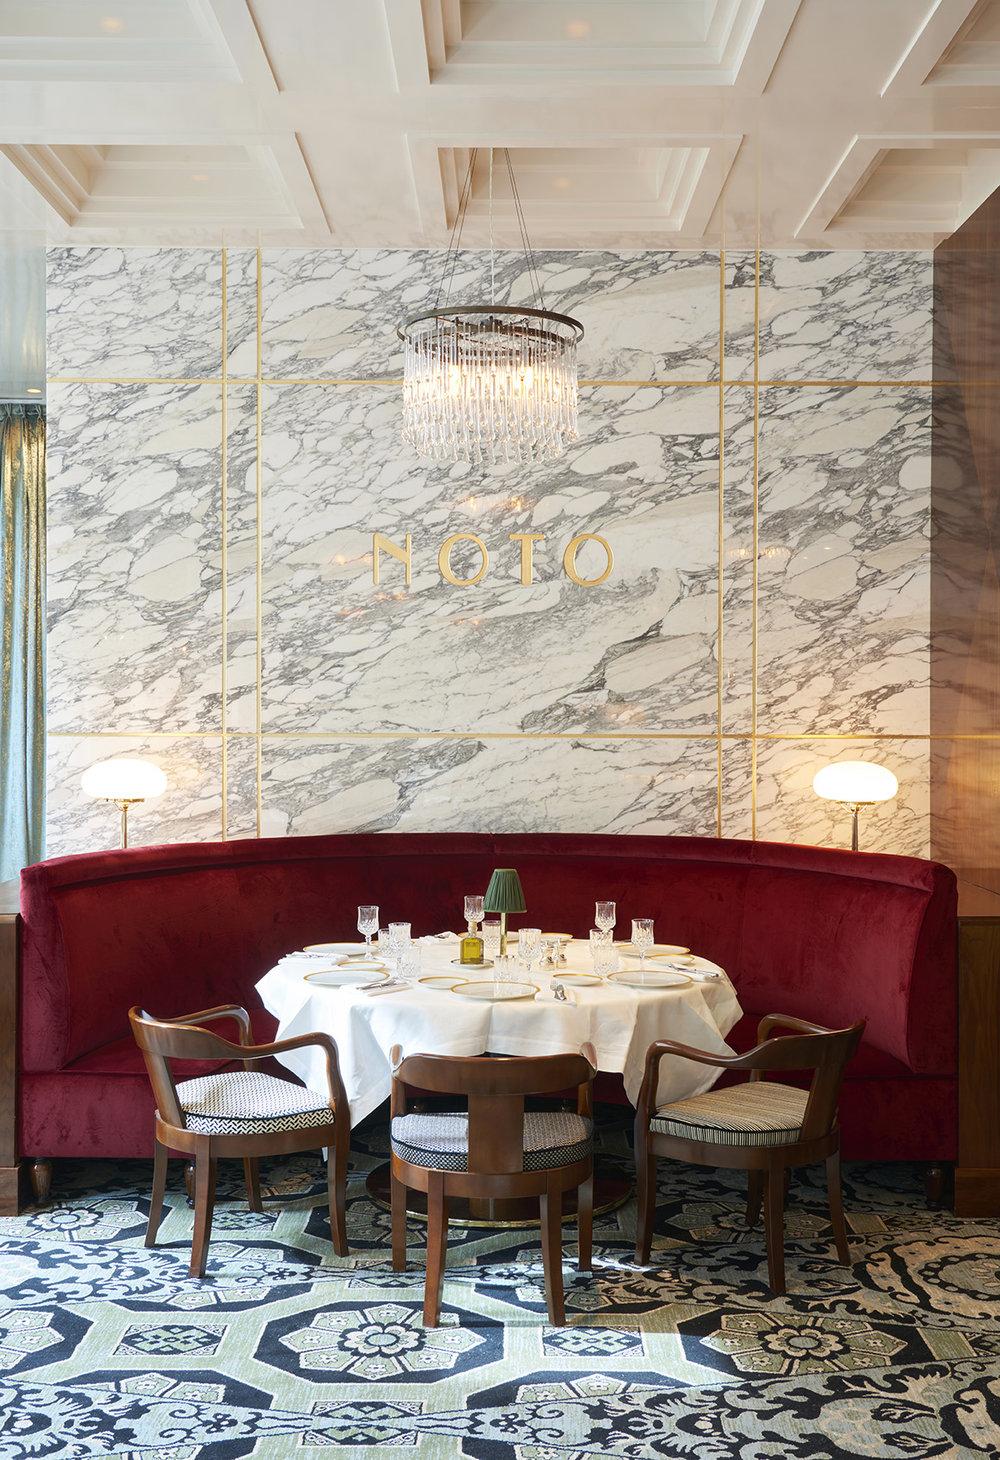 dallage mur marbre arabescatoRestaurant Noto Salle Pleyel Omni Marbres